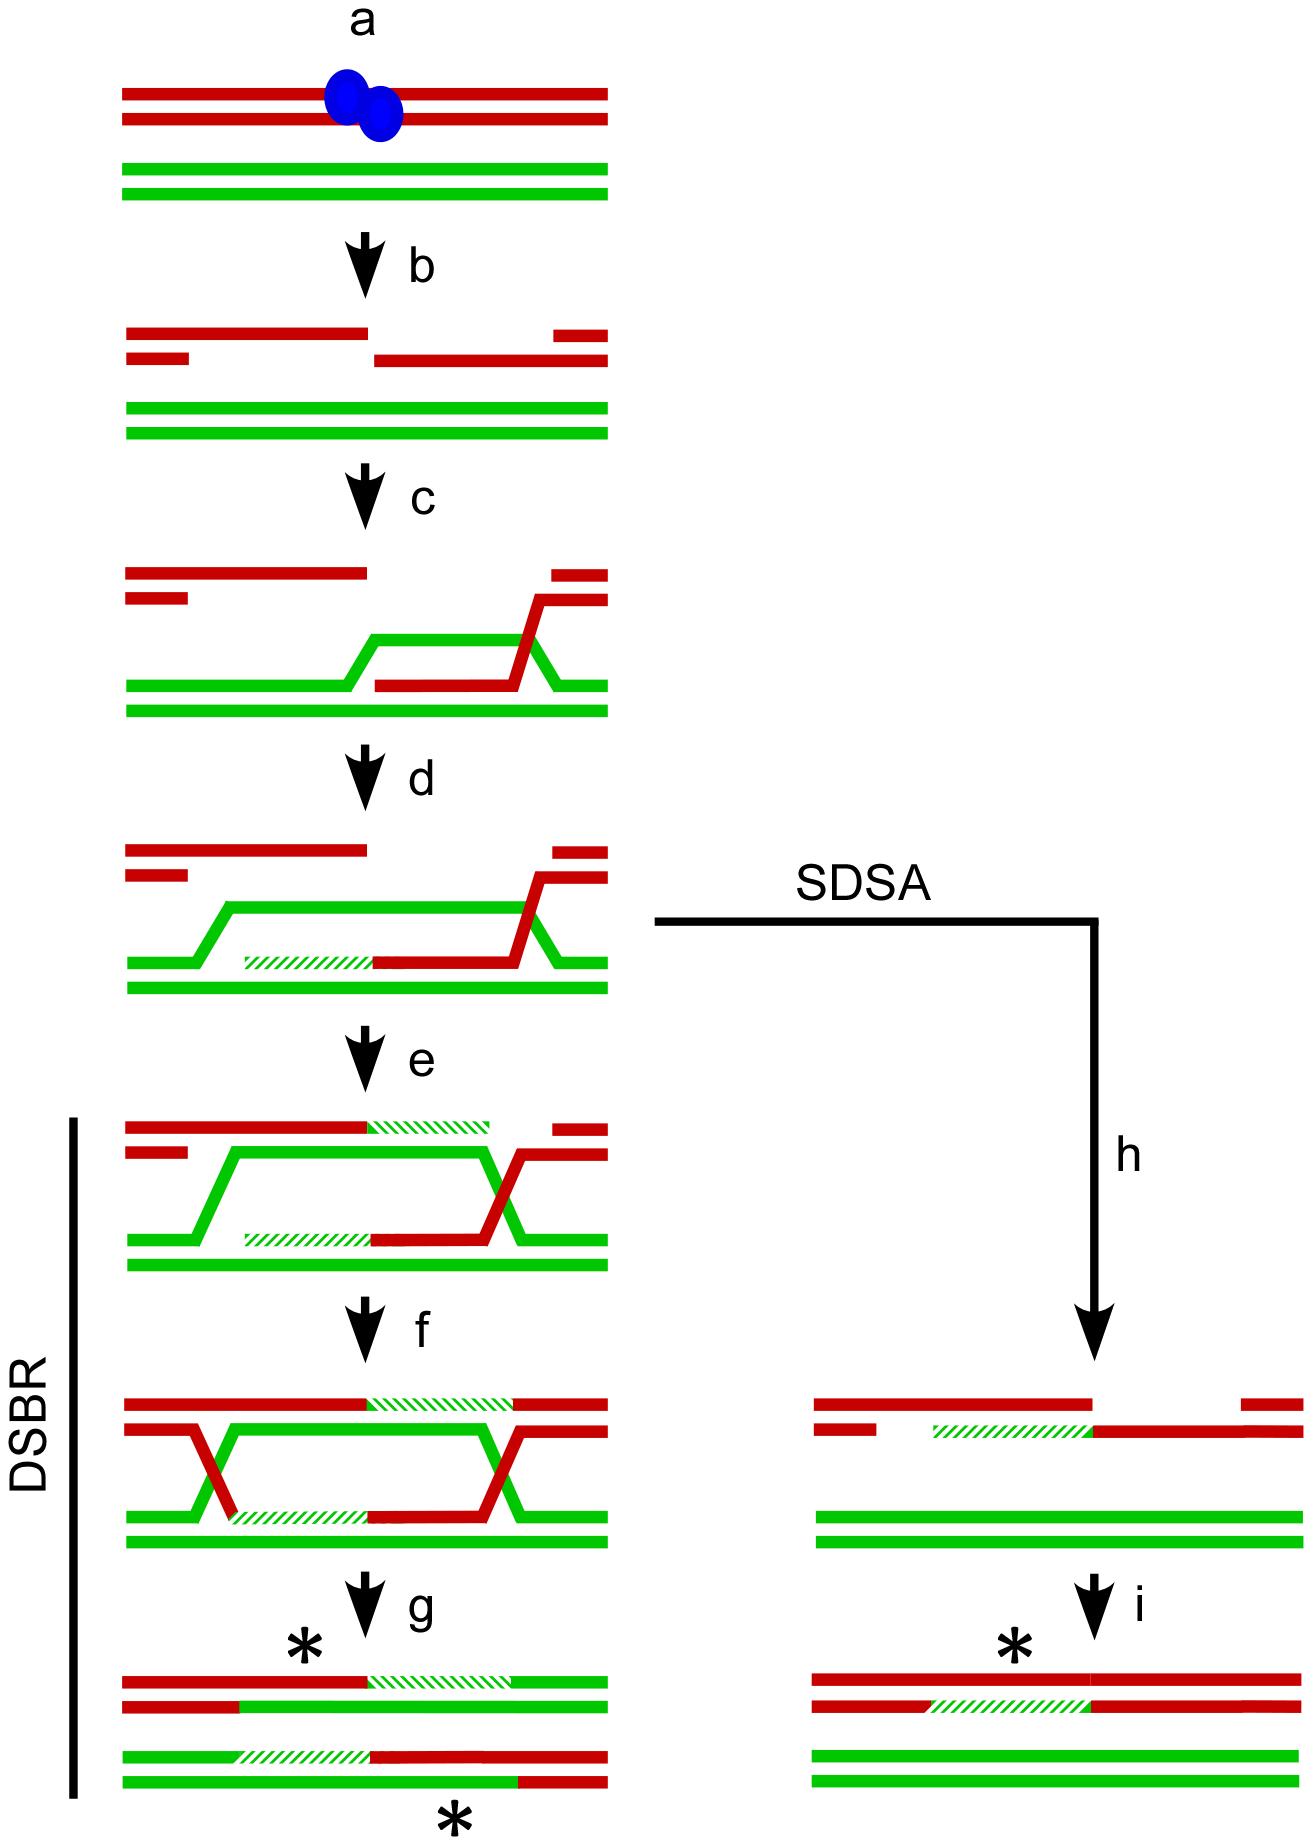 Meiotic recombination models.